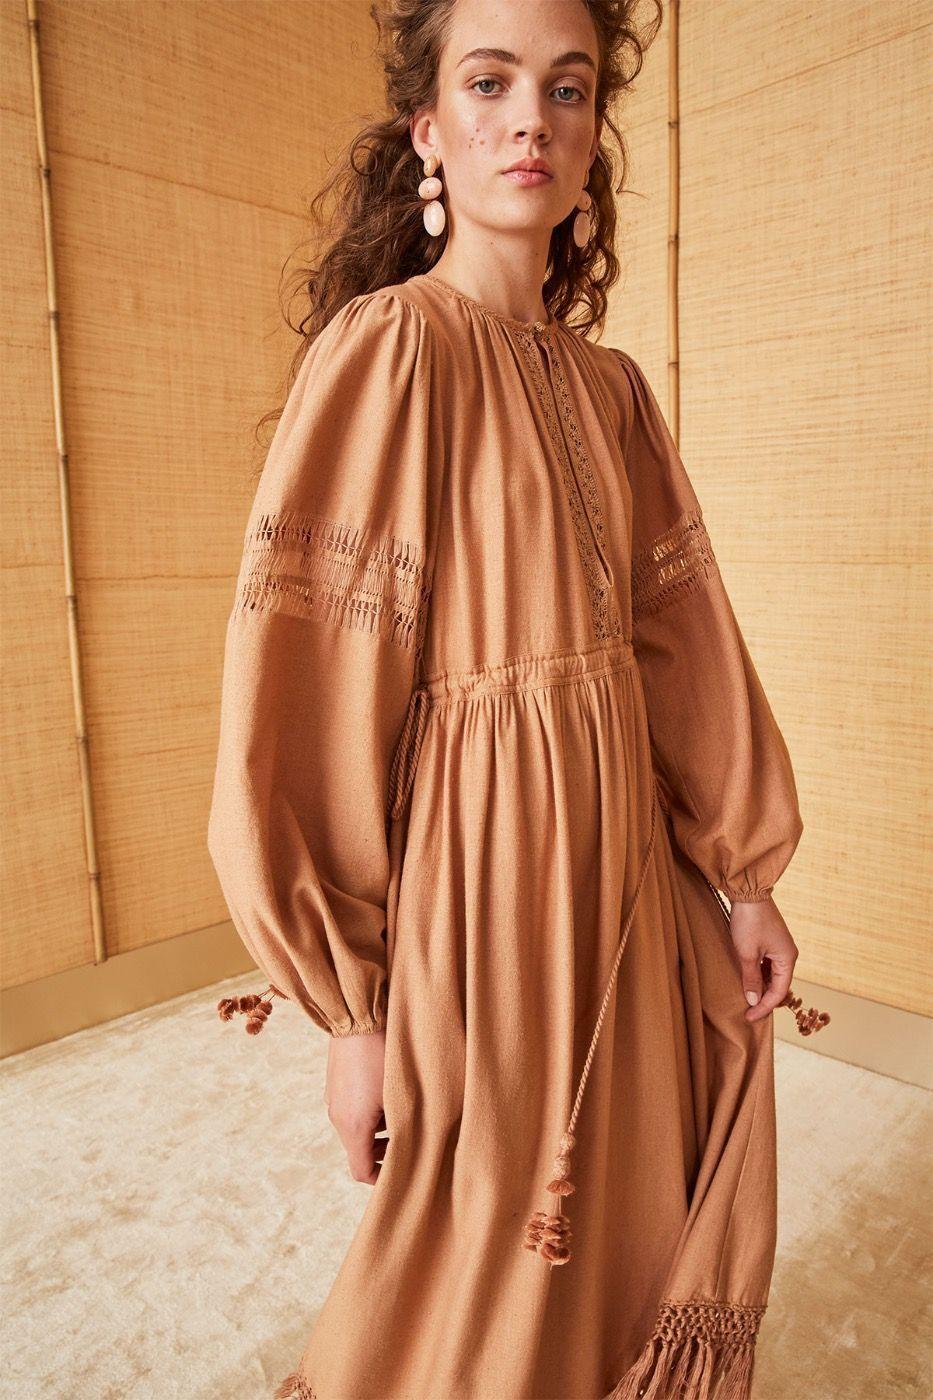 Ulla Johnson Kalea Dress in Clay. Handembroidered rustic